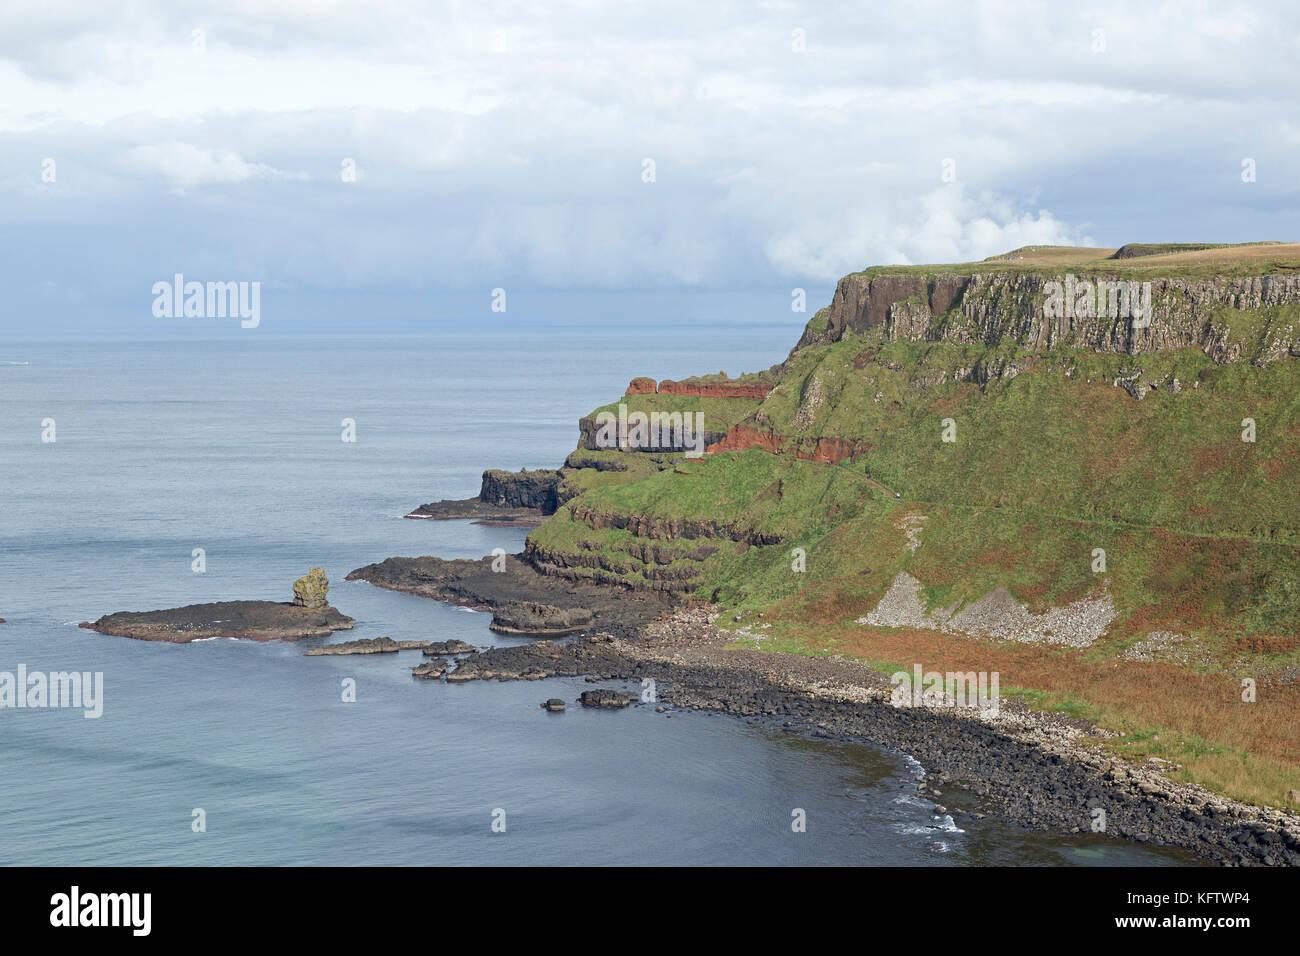 cliffs, Giants Causeway, Bushmills, Co. Antrim, Northern Ireland - Stock Image